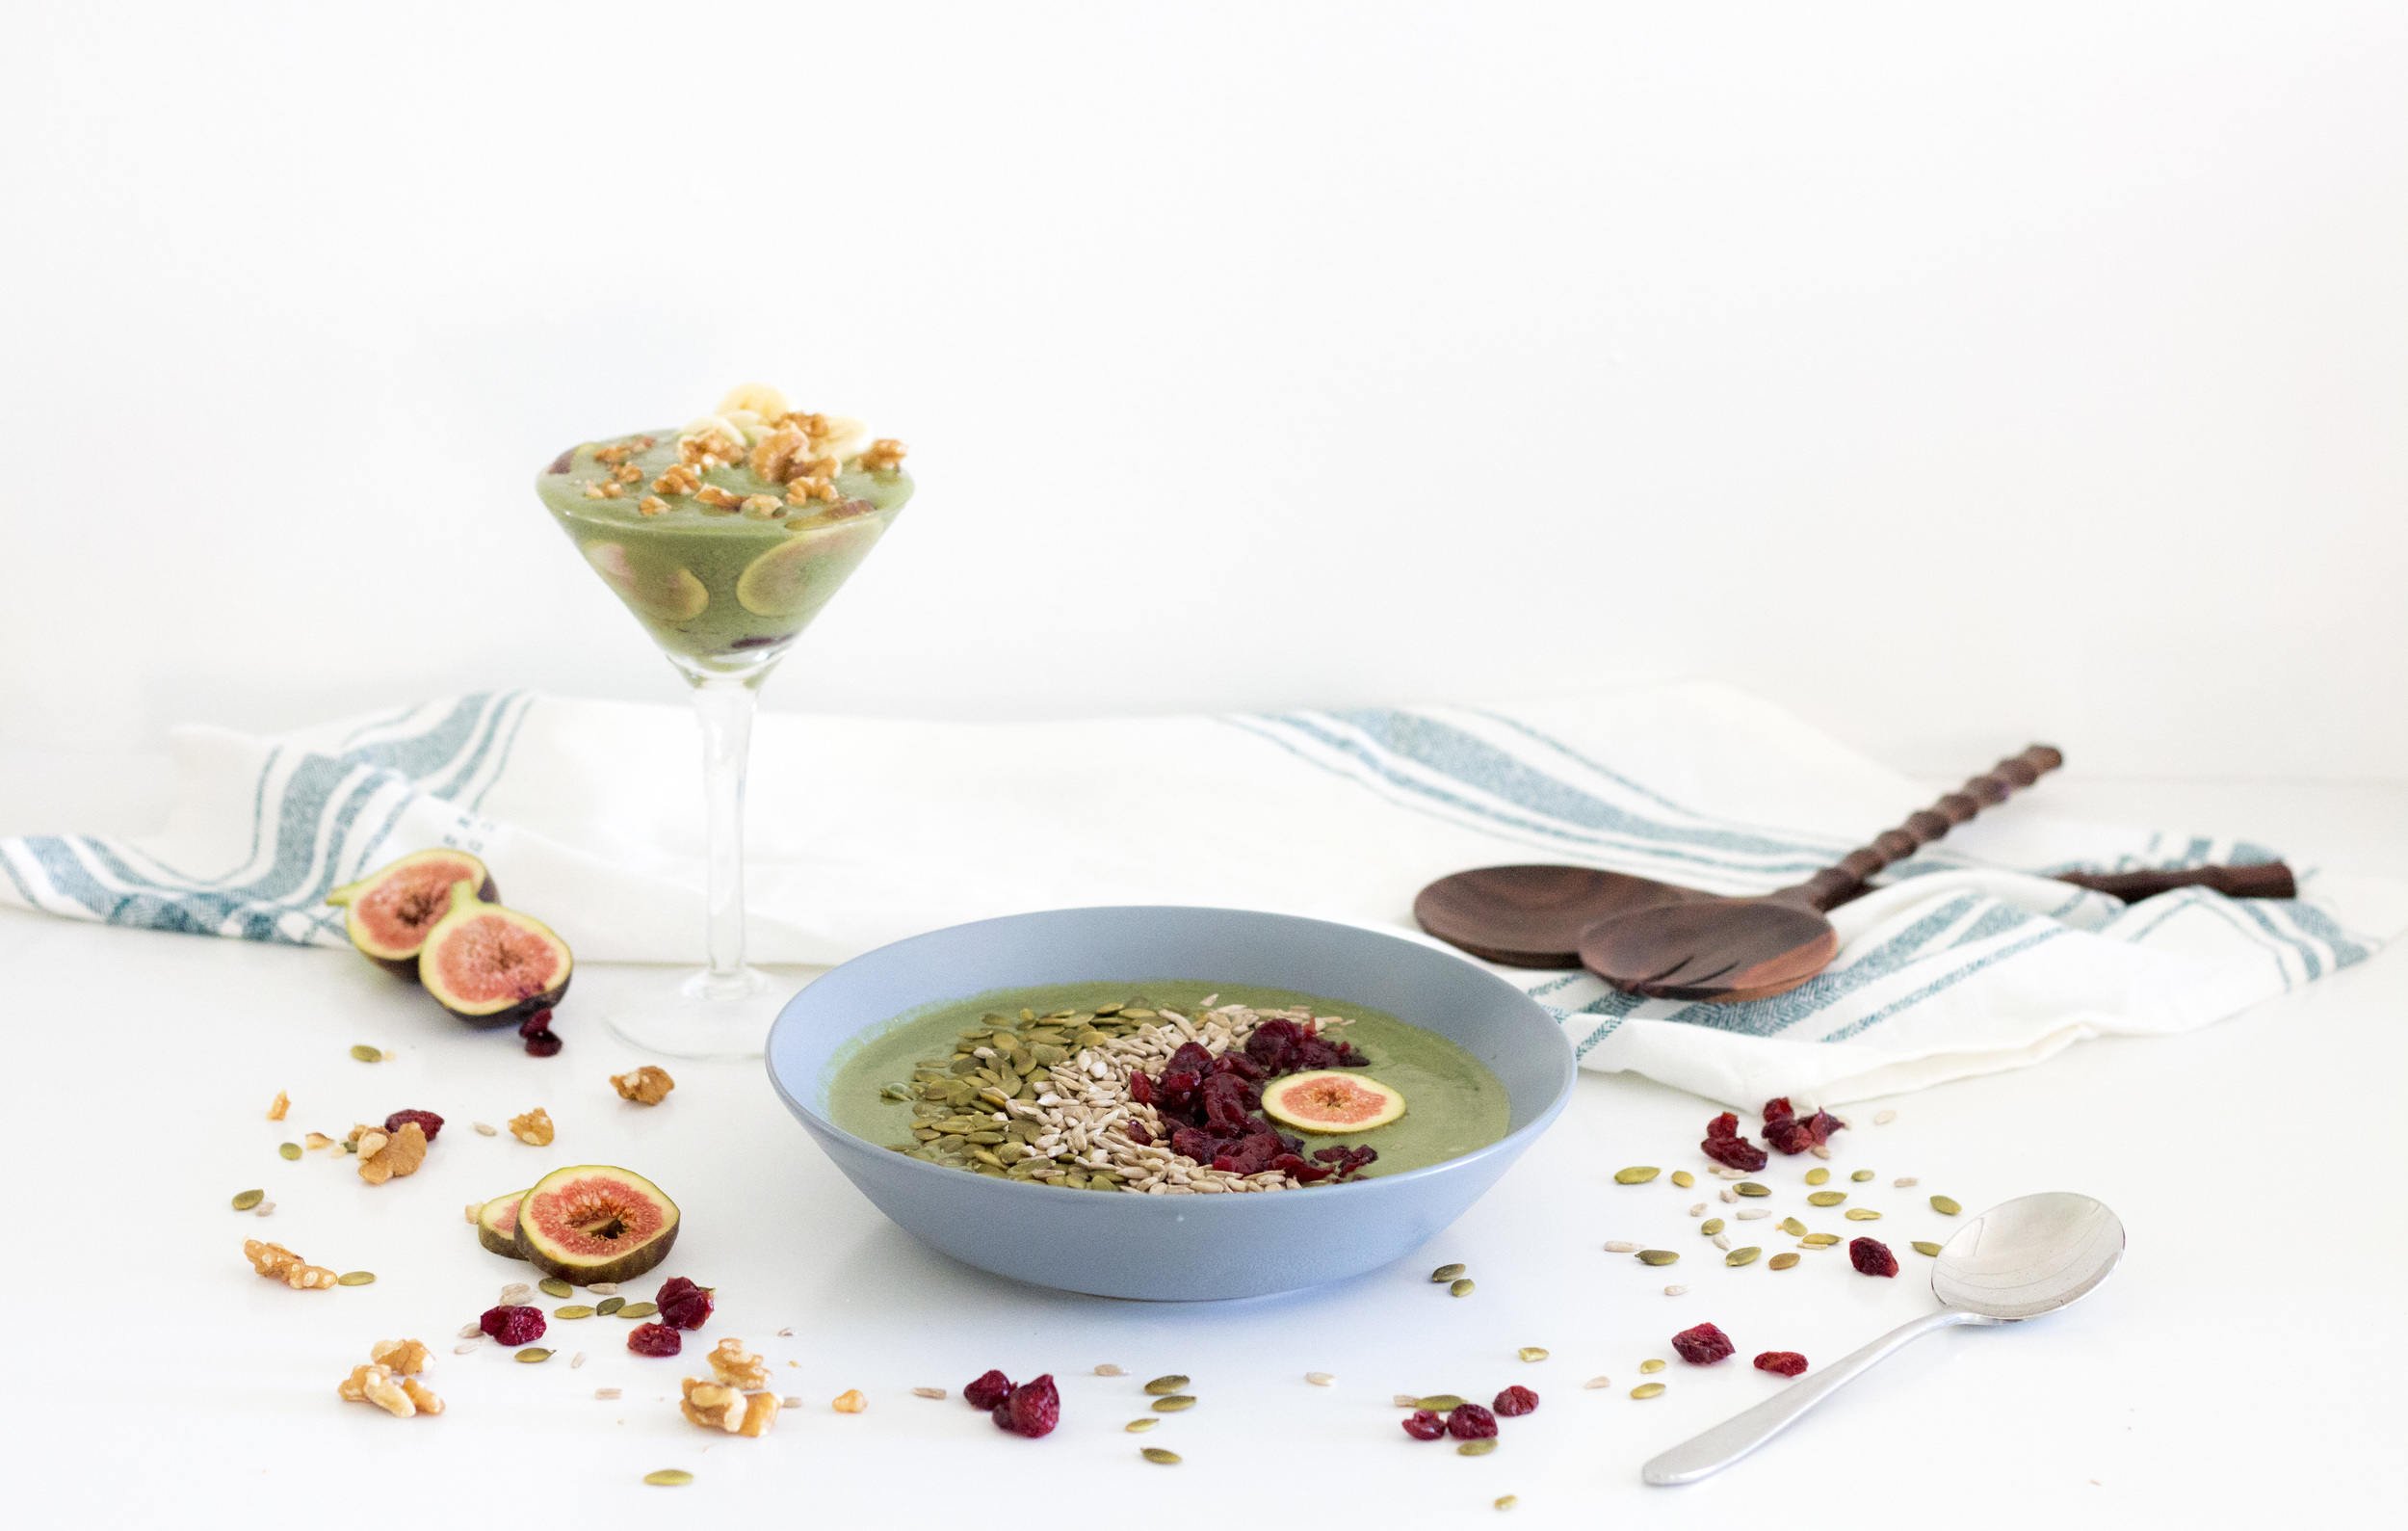 Food Photography & Styling  Nutritional Products -  Mayella Organics